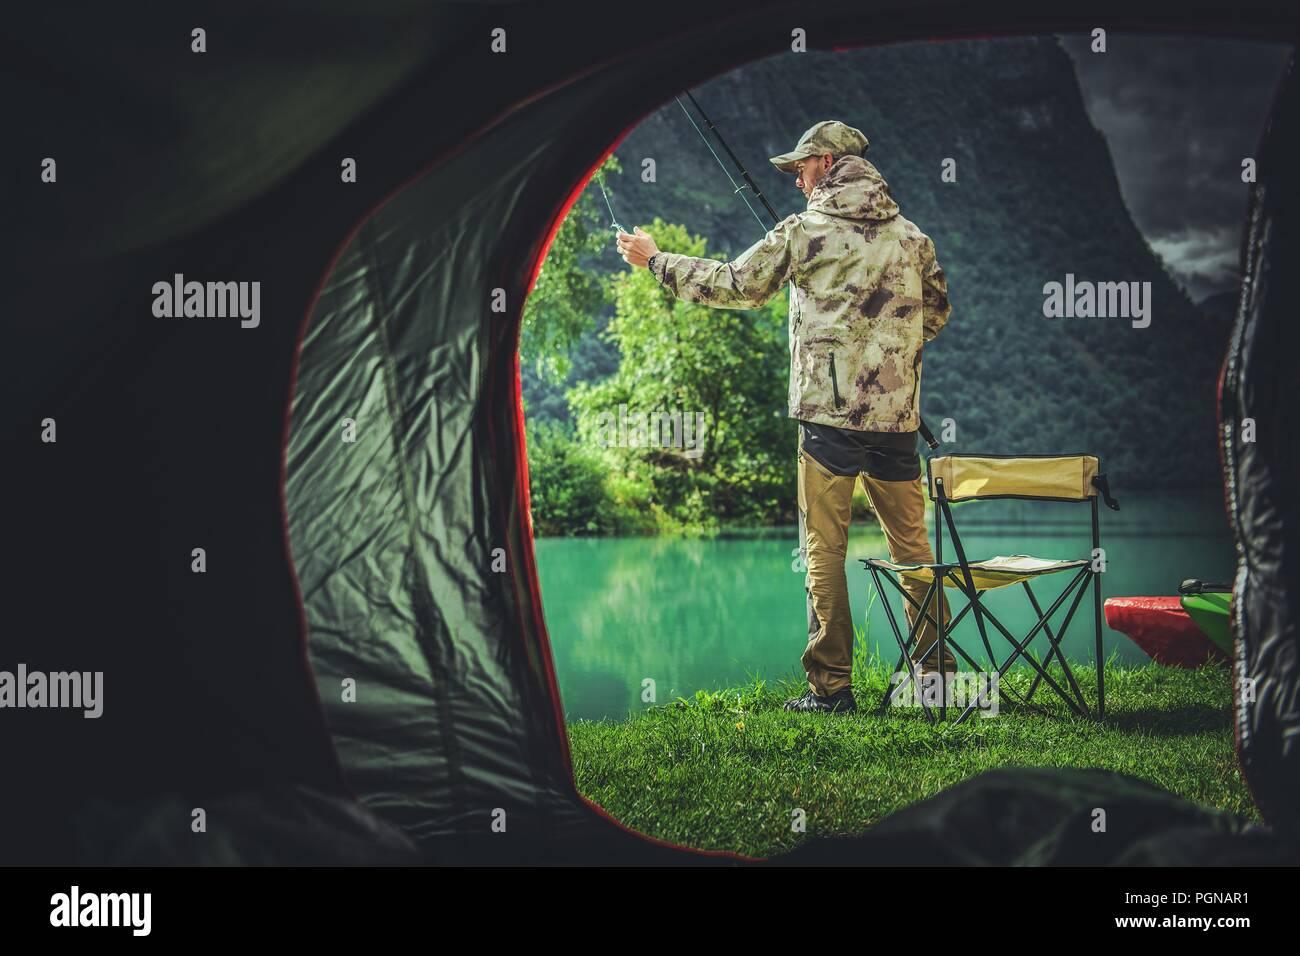 Camping Pêche de semaine. Caucasian Fisherman en face de sa tente. Photo Stock